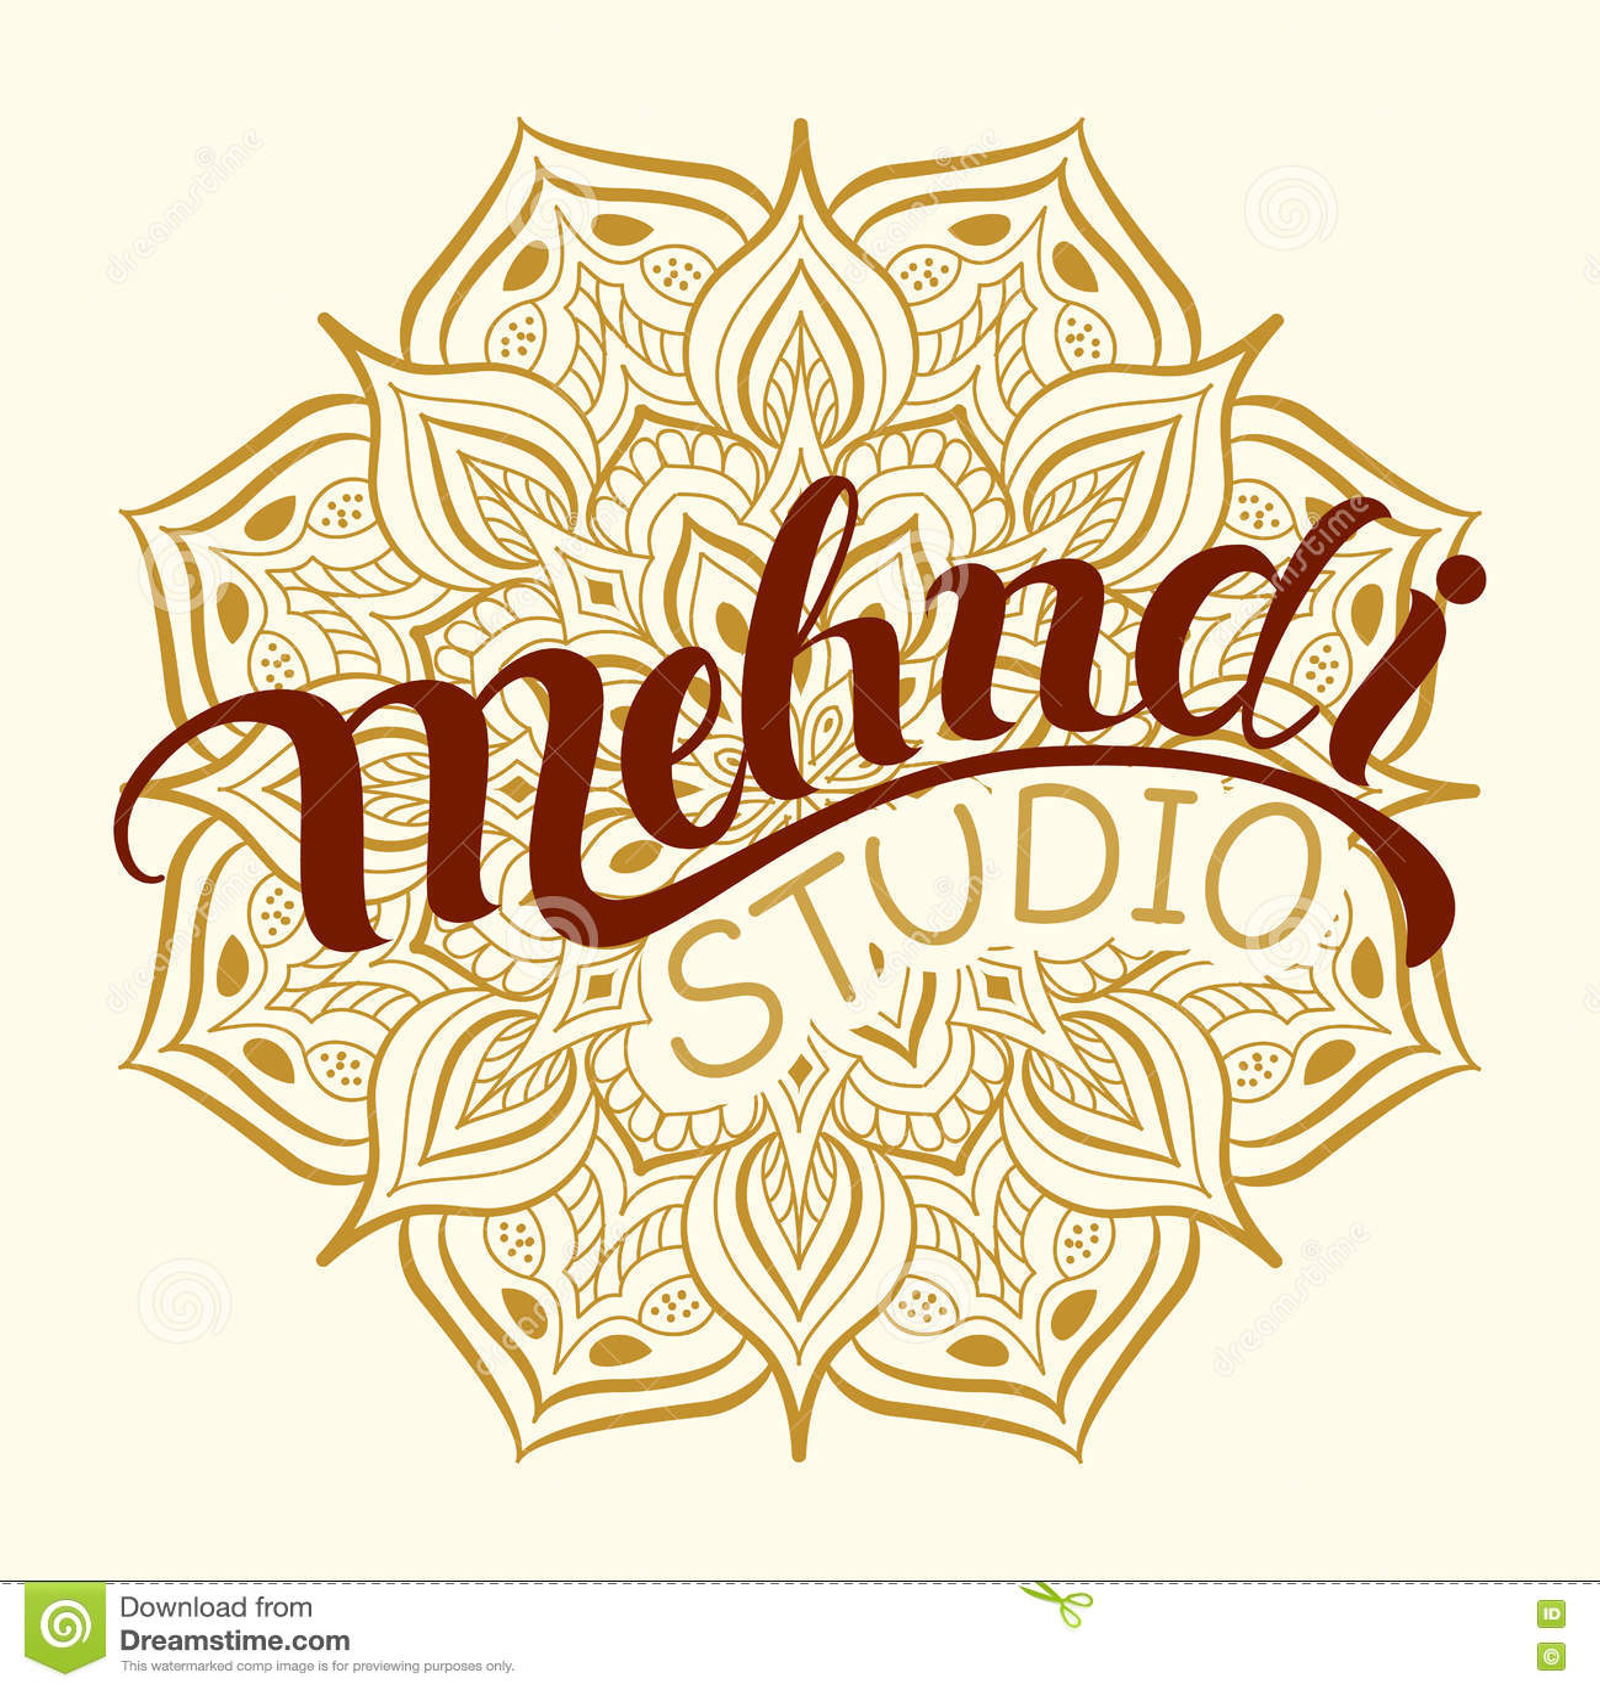 Mehndi Studio Logo Stock Vector Illustration Of Banner 80075591